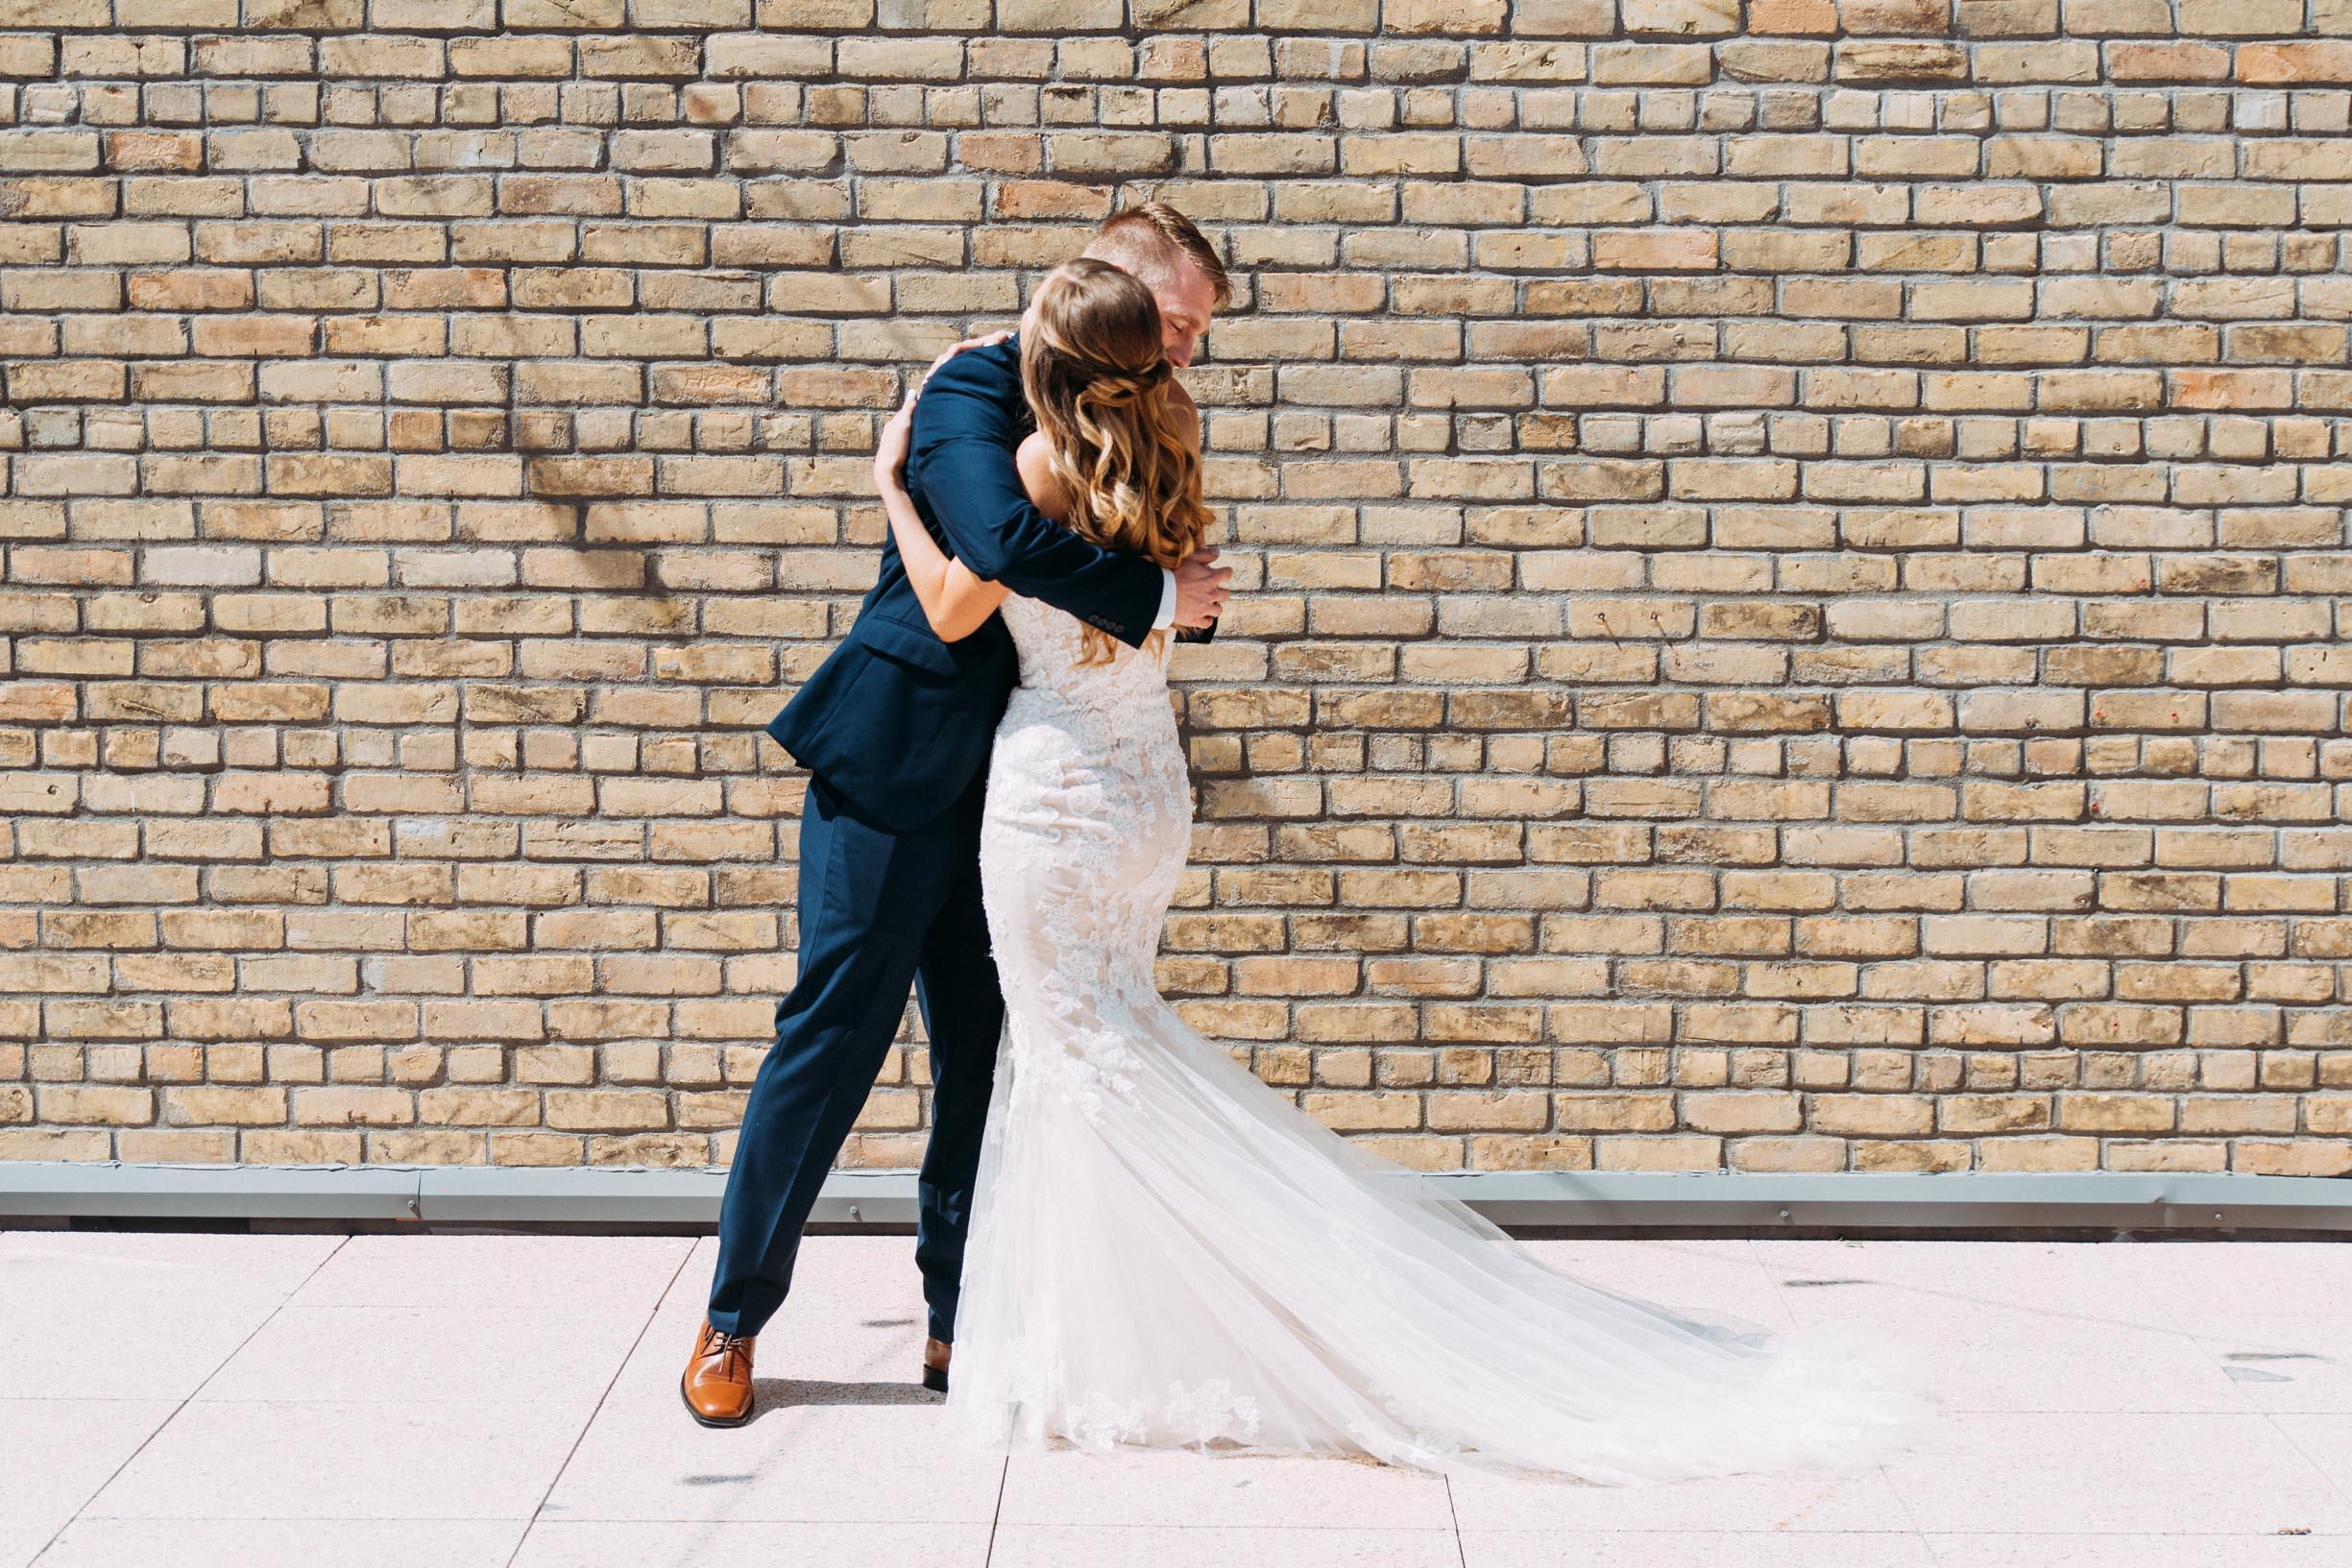 13-WeddingsattheBroz_Minnesota_WeddingBlog.jpg